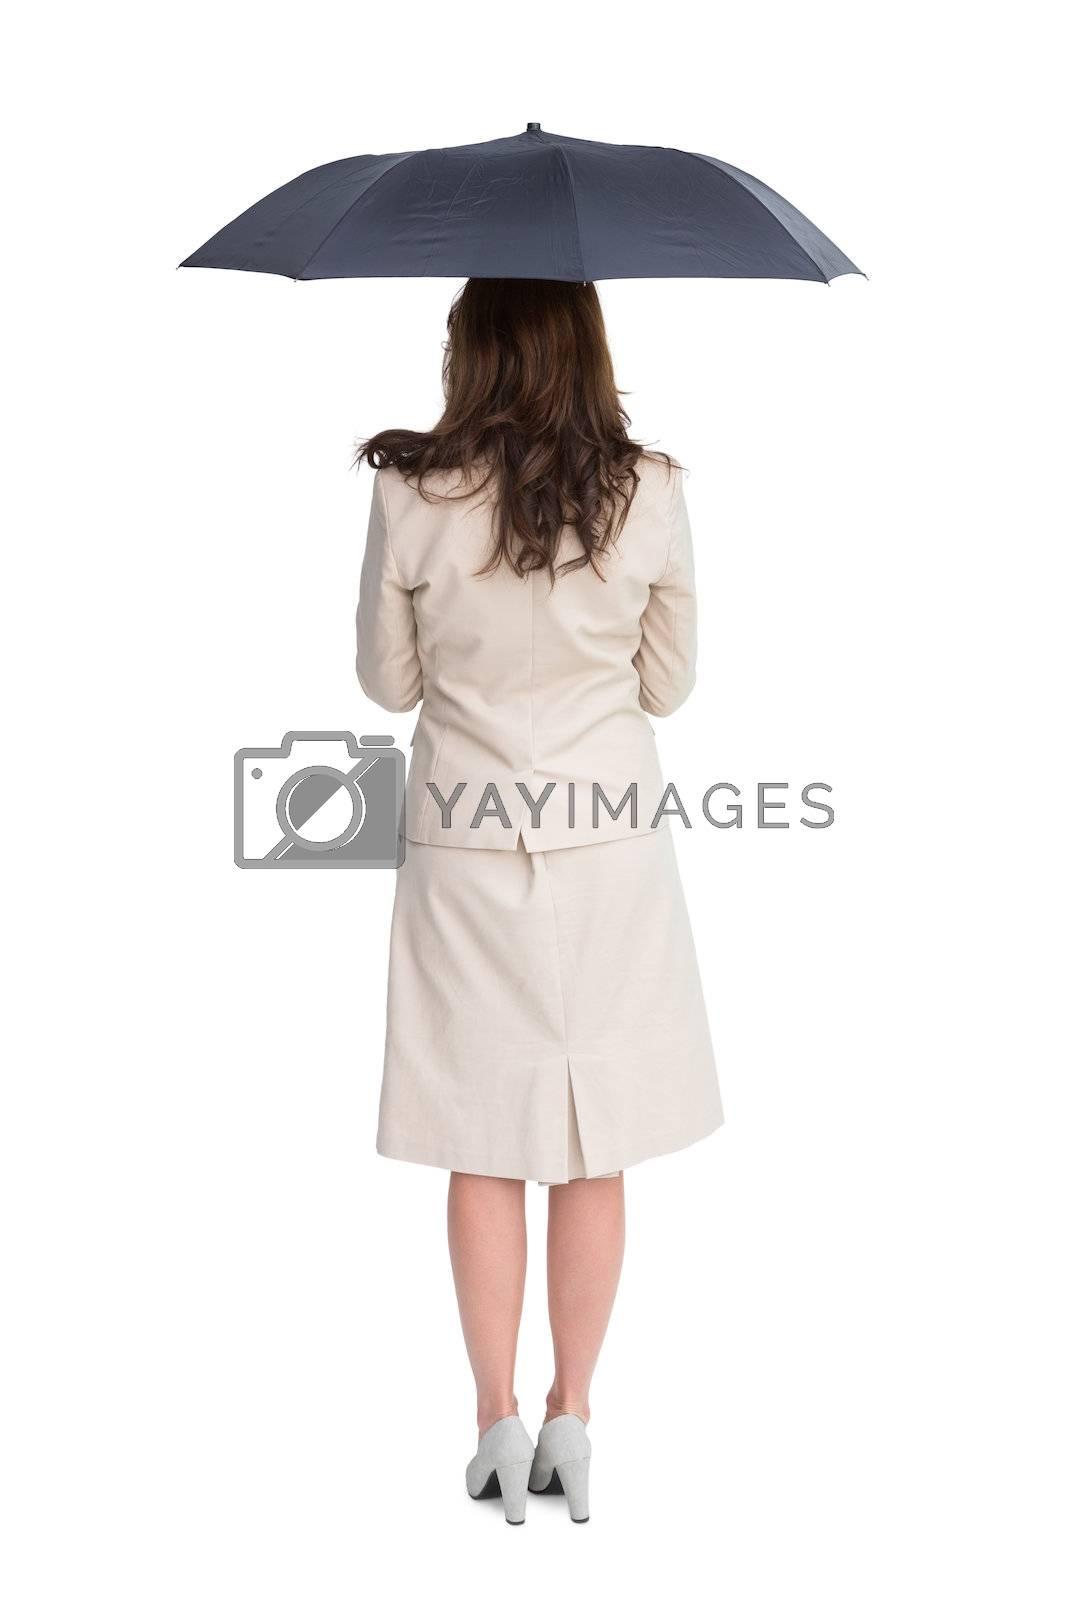 Rear view of classy businesswoman holding umbrella by Wavebreakmedia